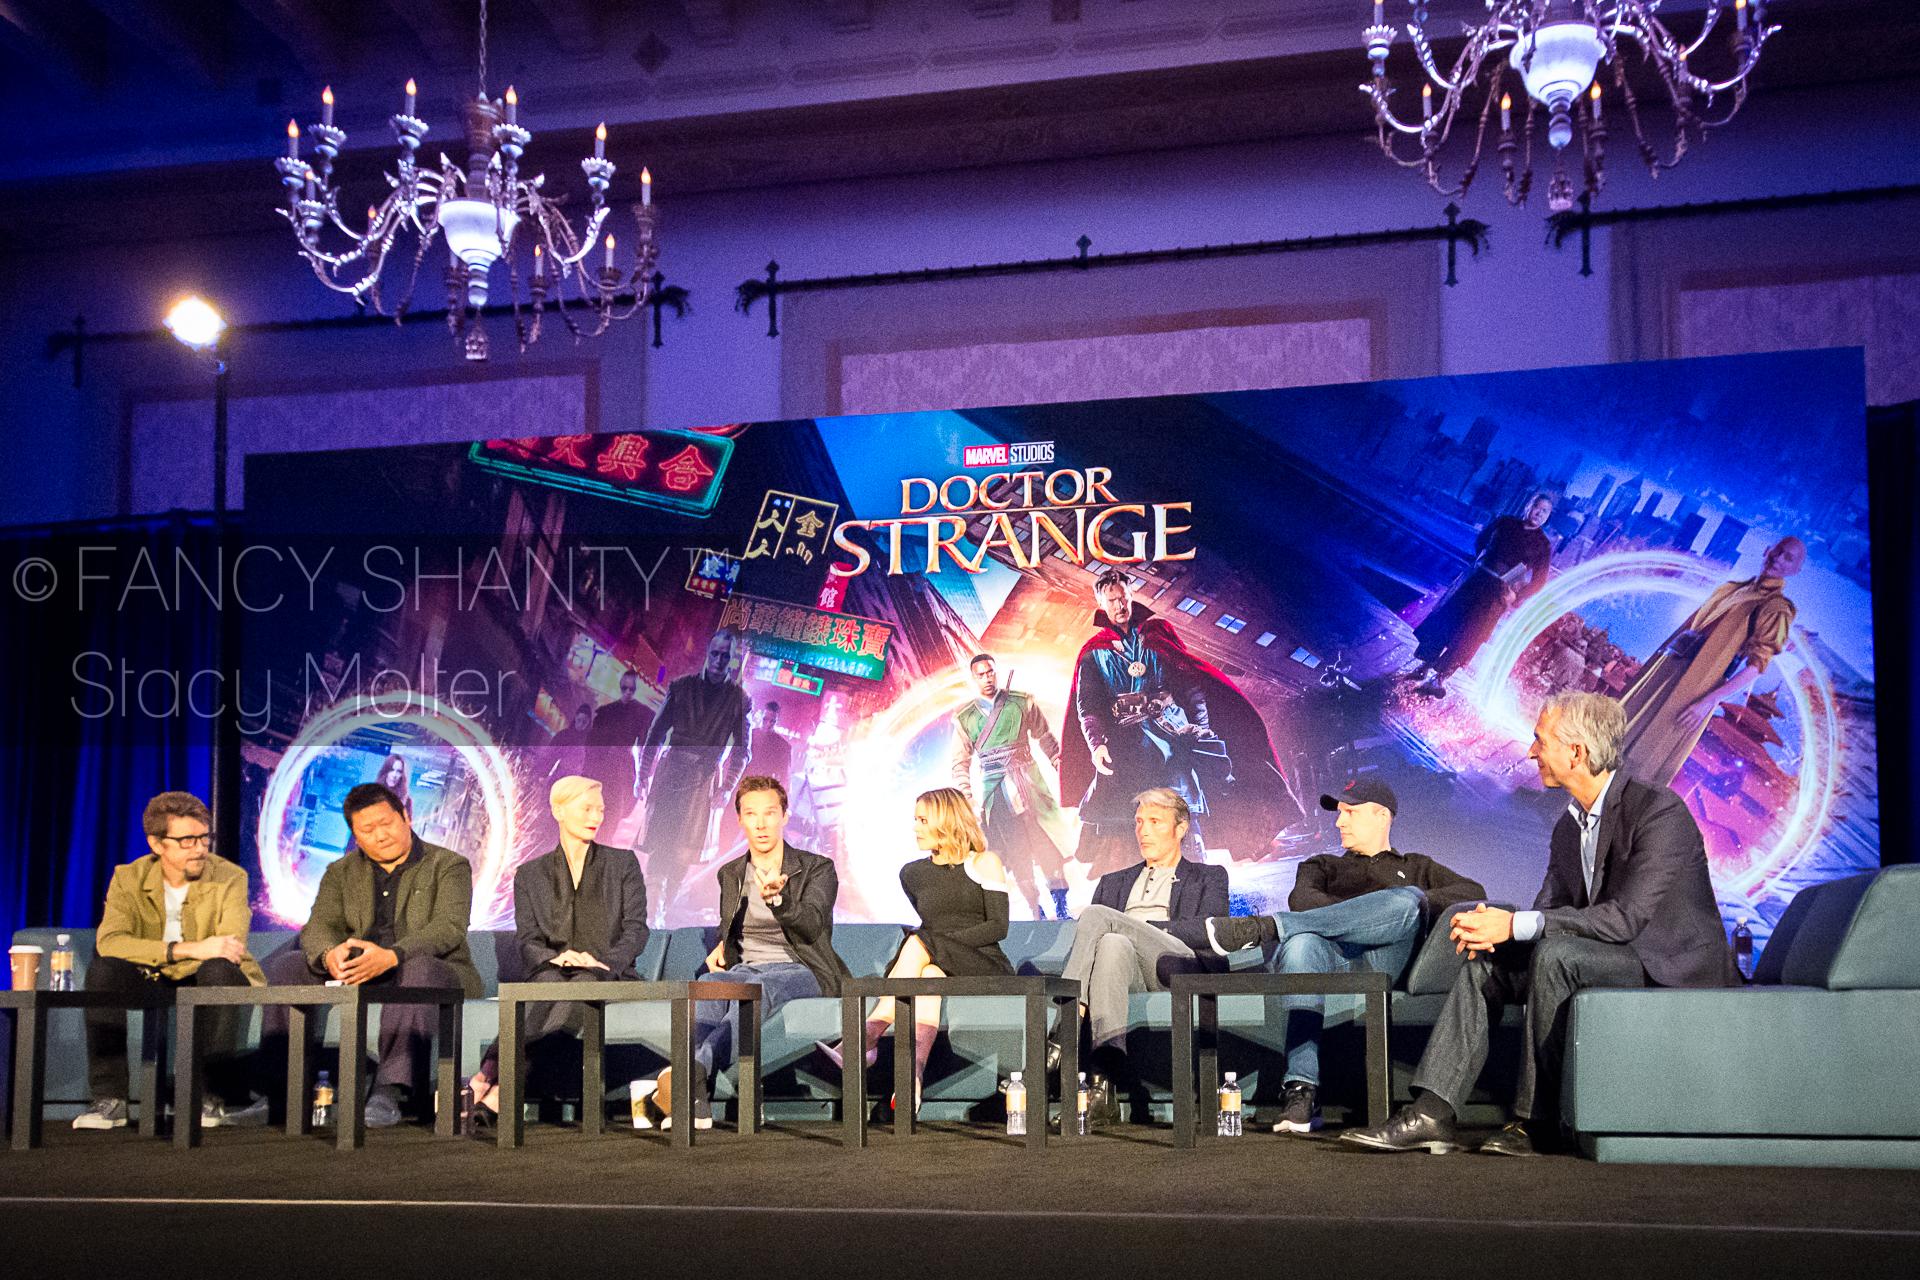 Benedict Cumberbatch. Mads Mikkelsen, Rachel McAdams, Benedict Wong, Scott Derrickson, Tilda Swinton, Kevin Feige - Doctor Strange Press Conference